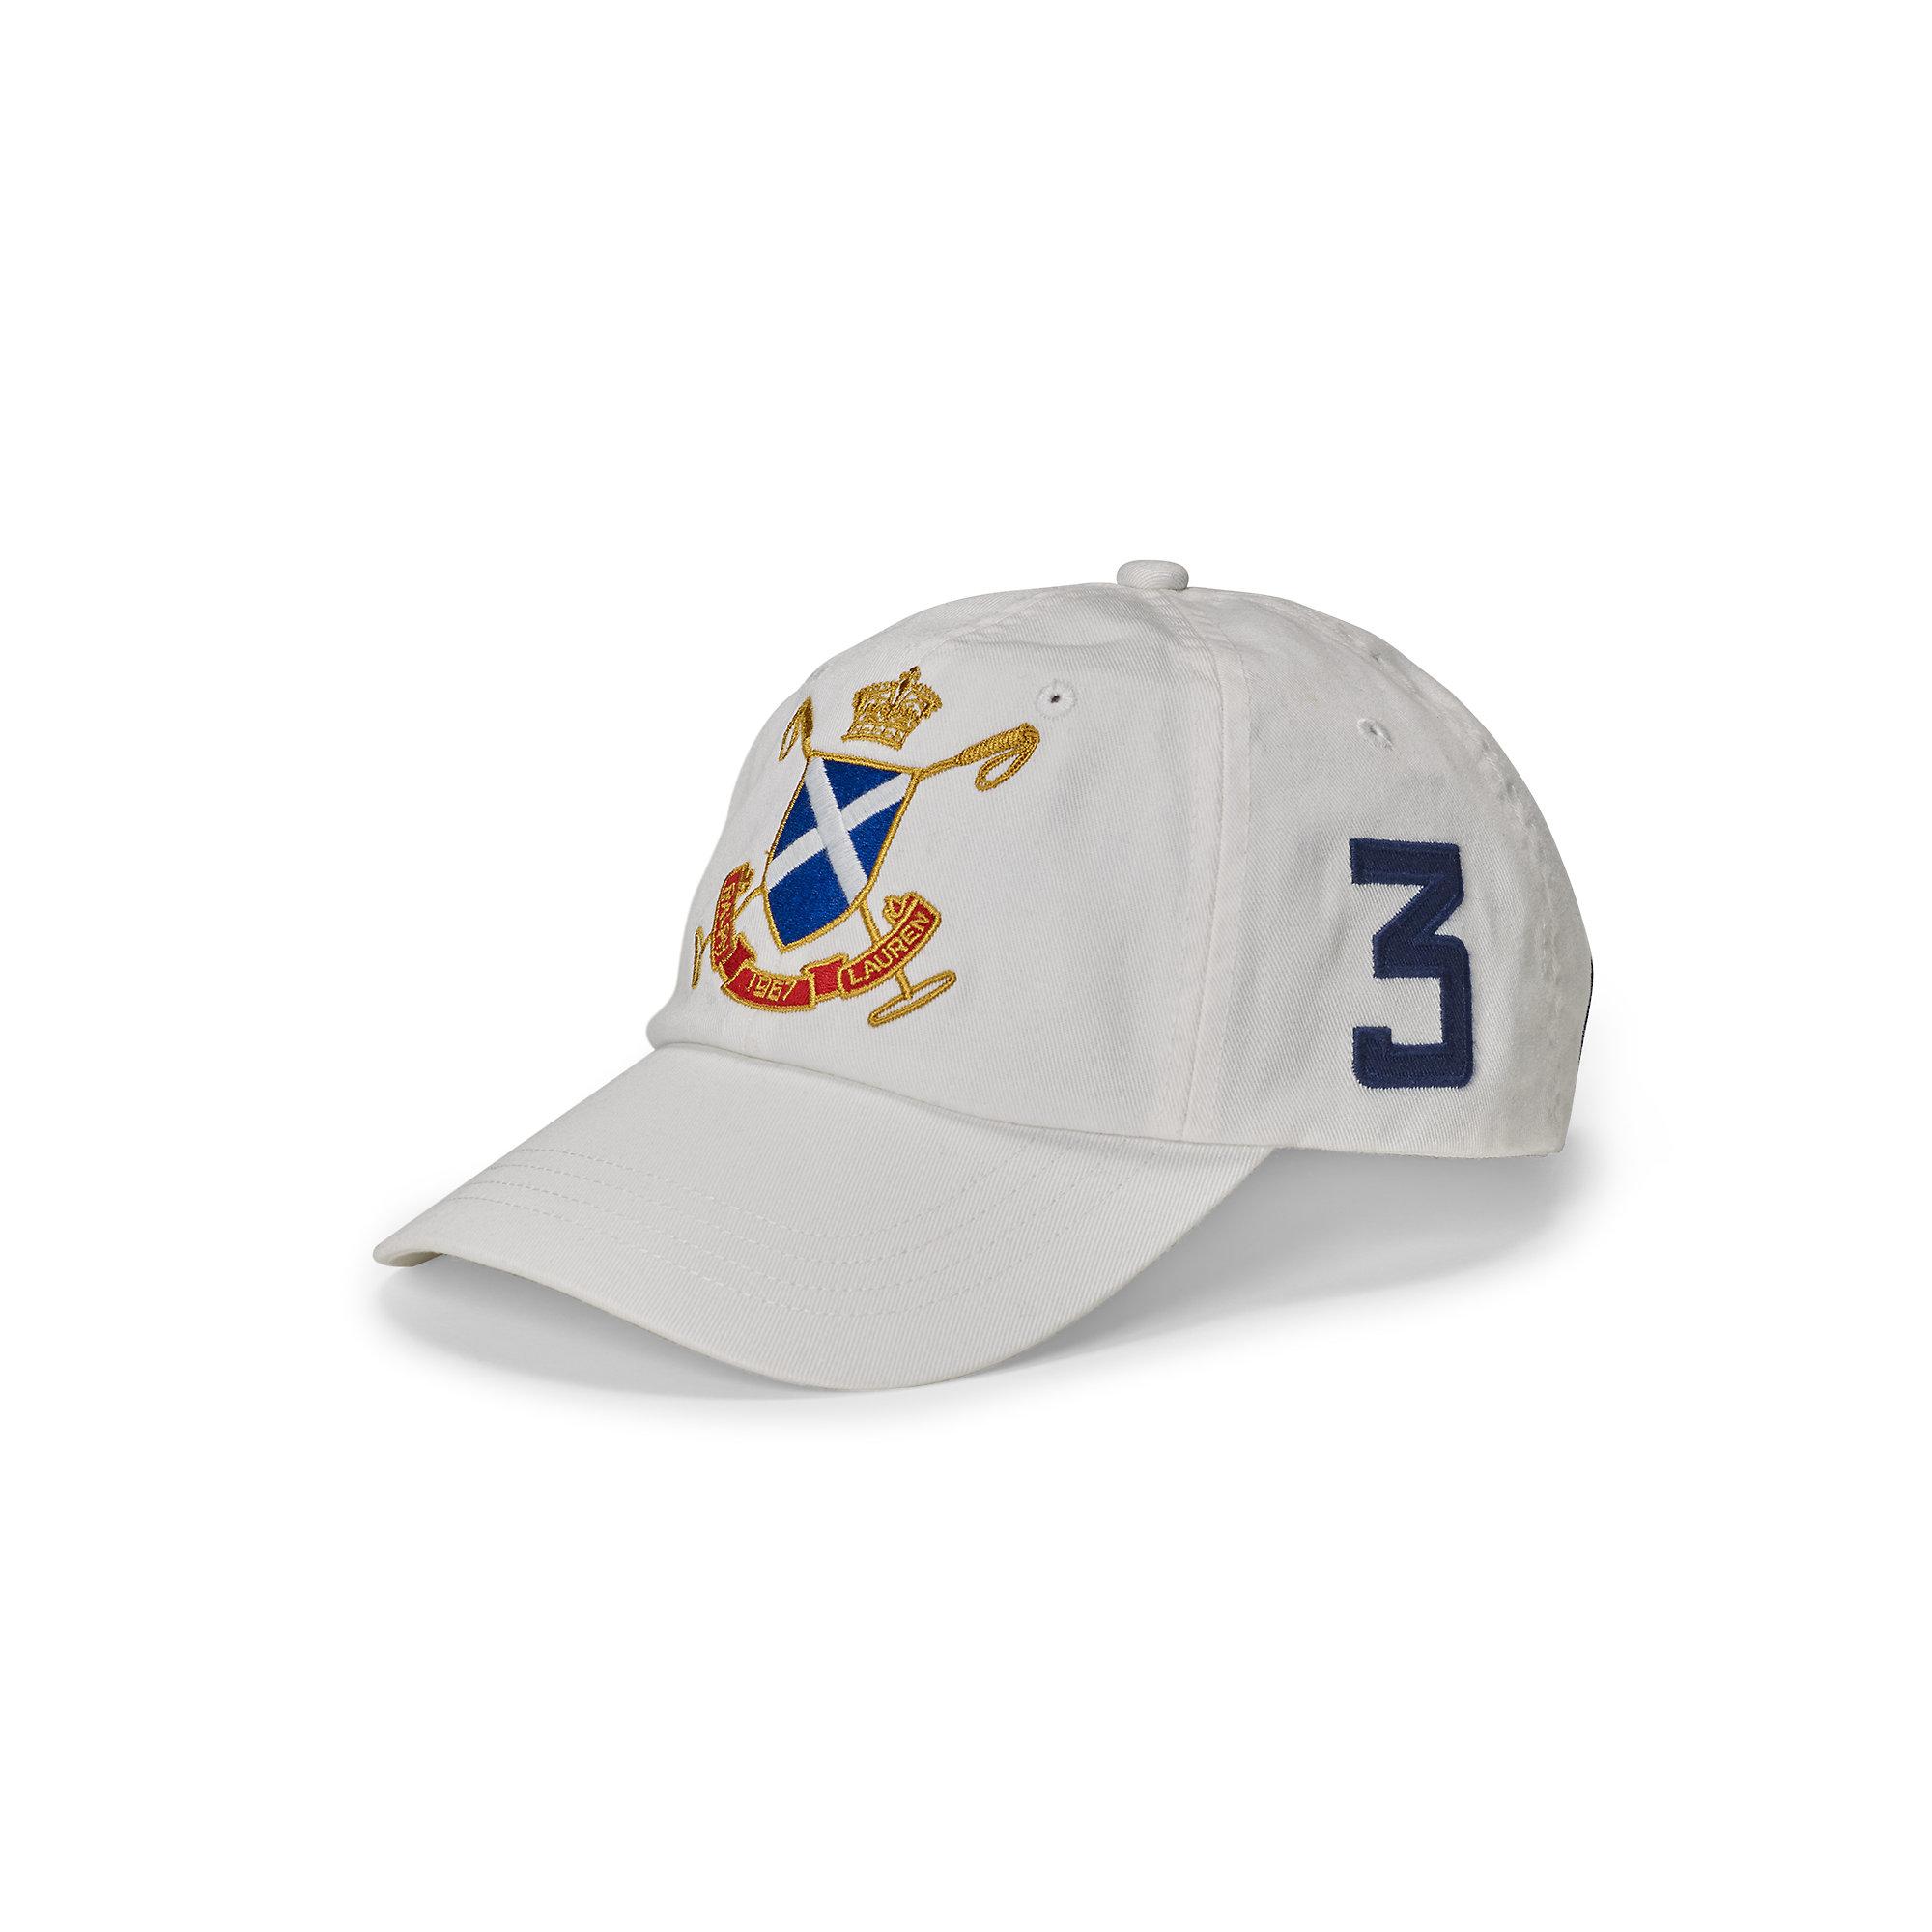 Lyst - Polo Ralph Lauren Blackwatch Cotton Baseball Cap in White for Men 4fcfe826b03a